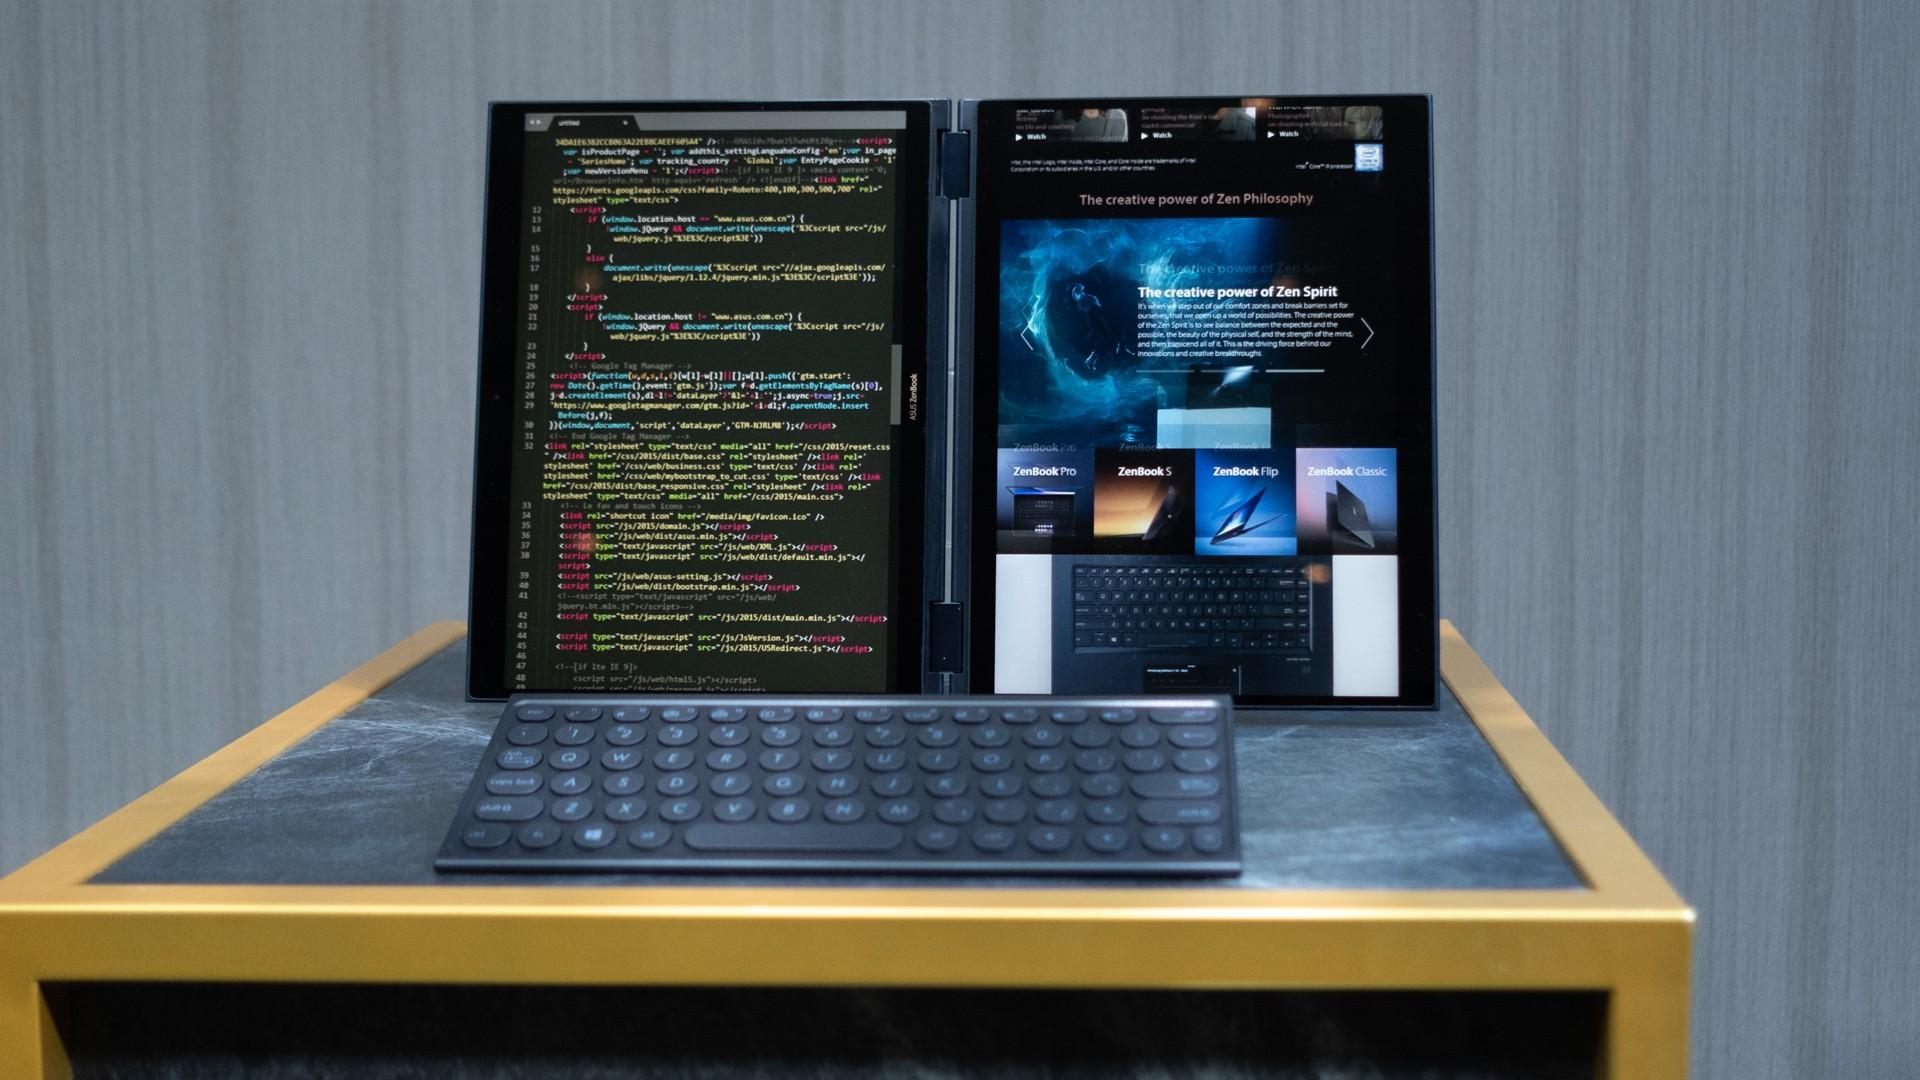 Asus представила ноутбук с двумя дисплеями